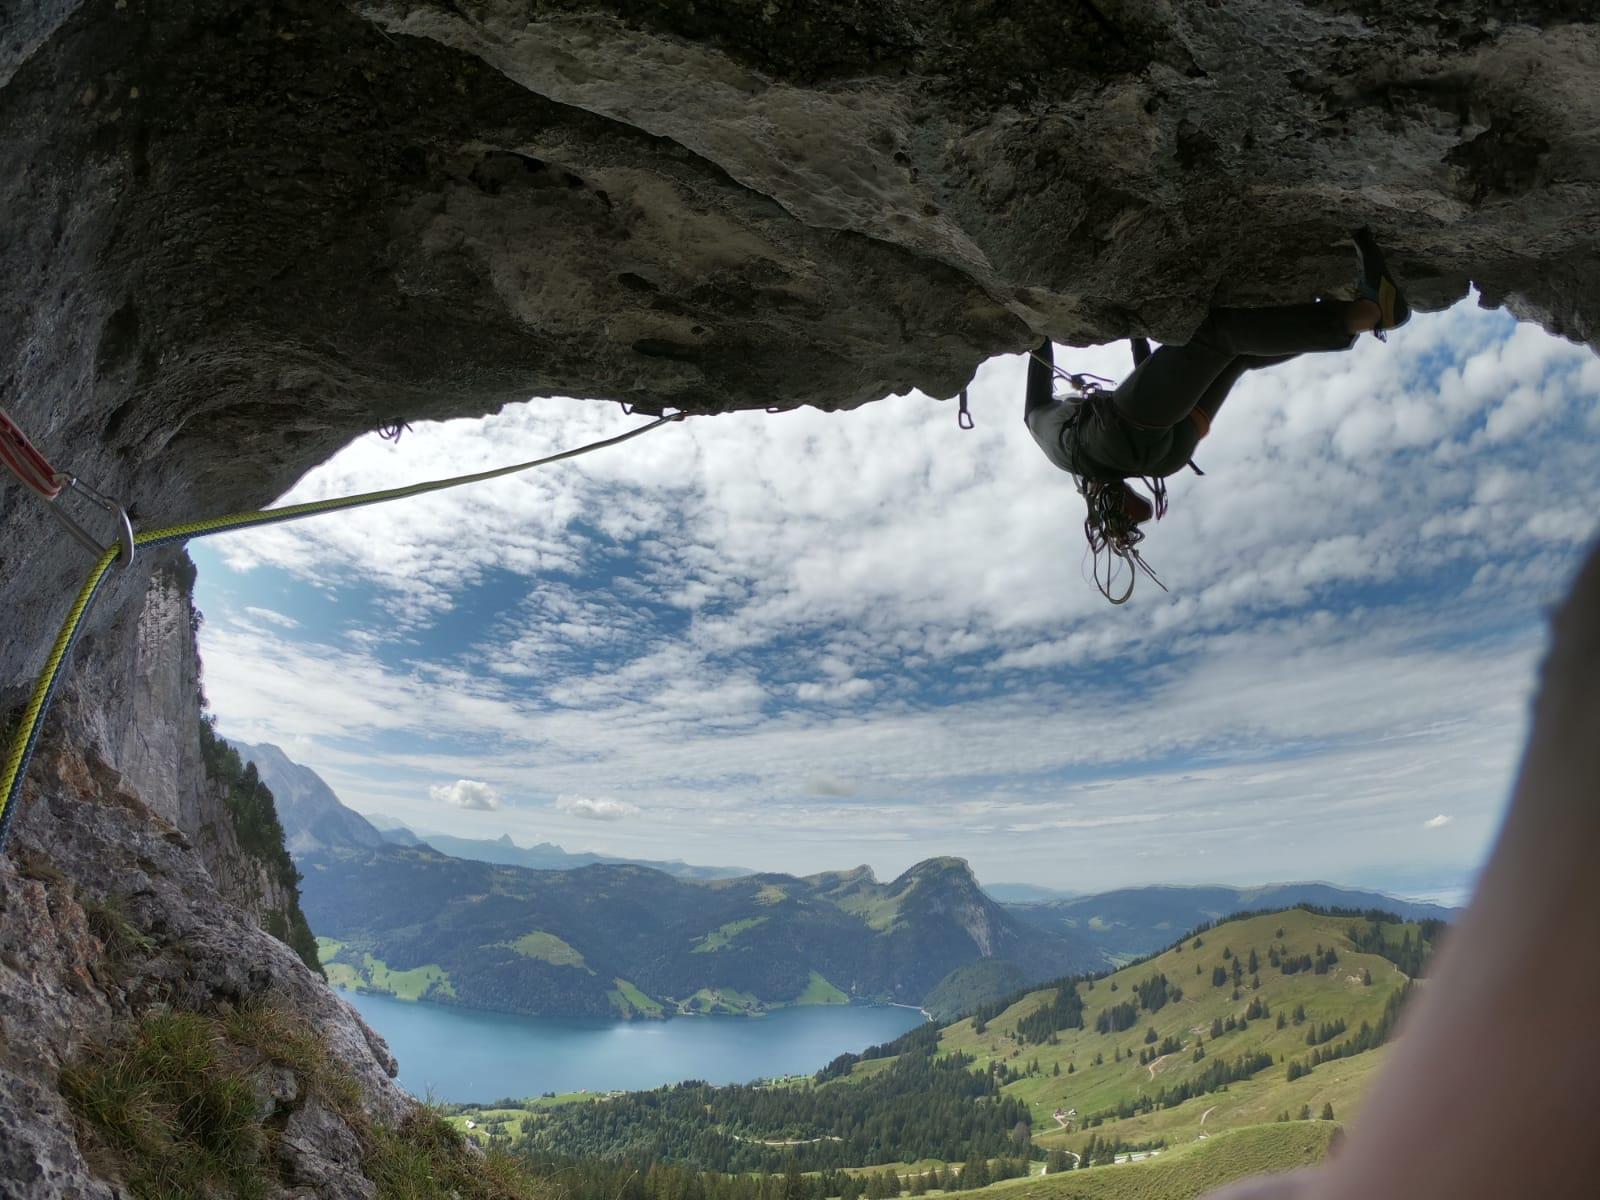 Die Angst im Griff, Foto: Martina Scheichl |Climbers Paradise